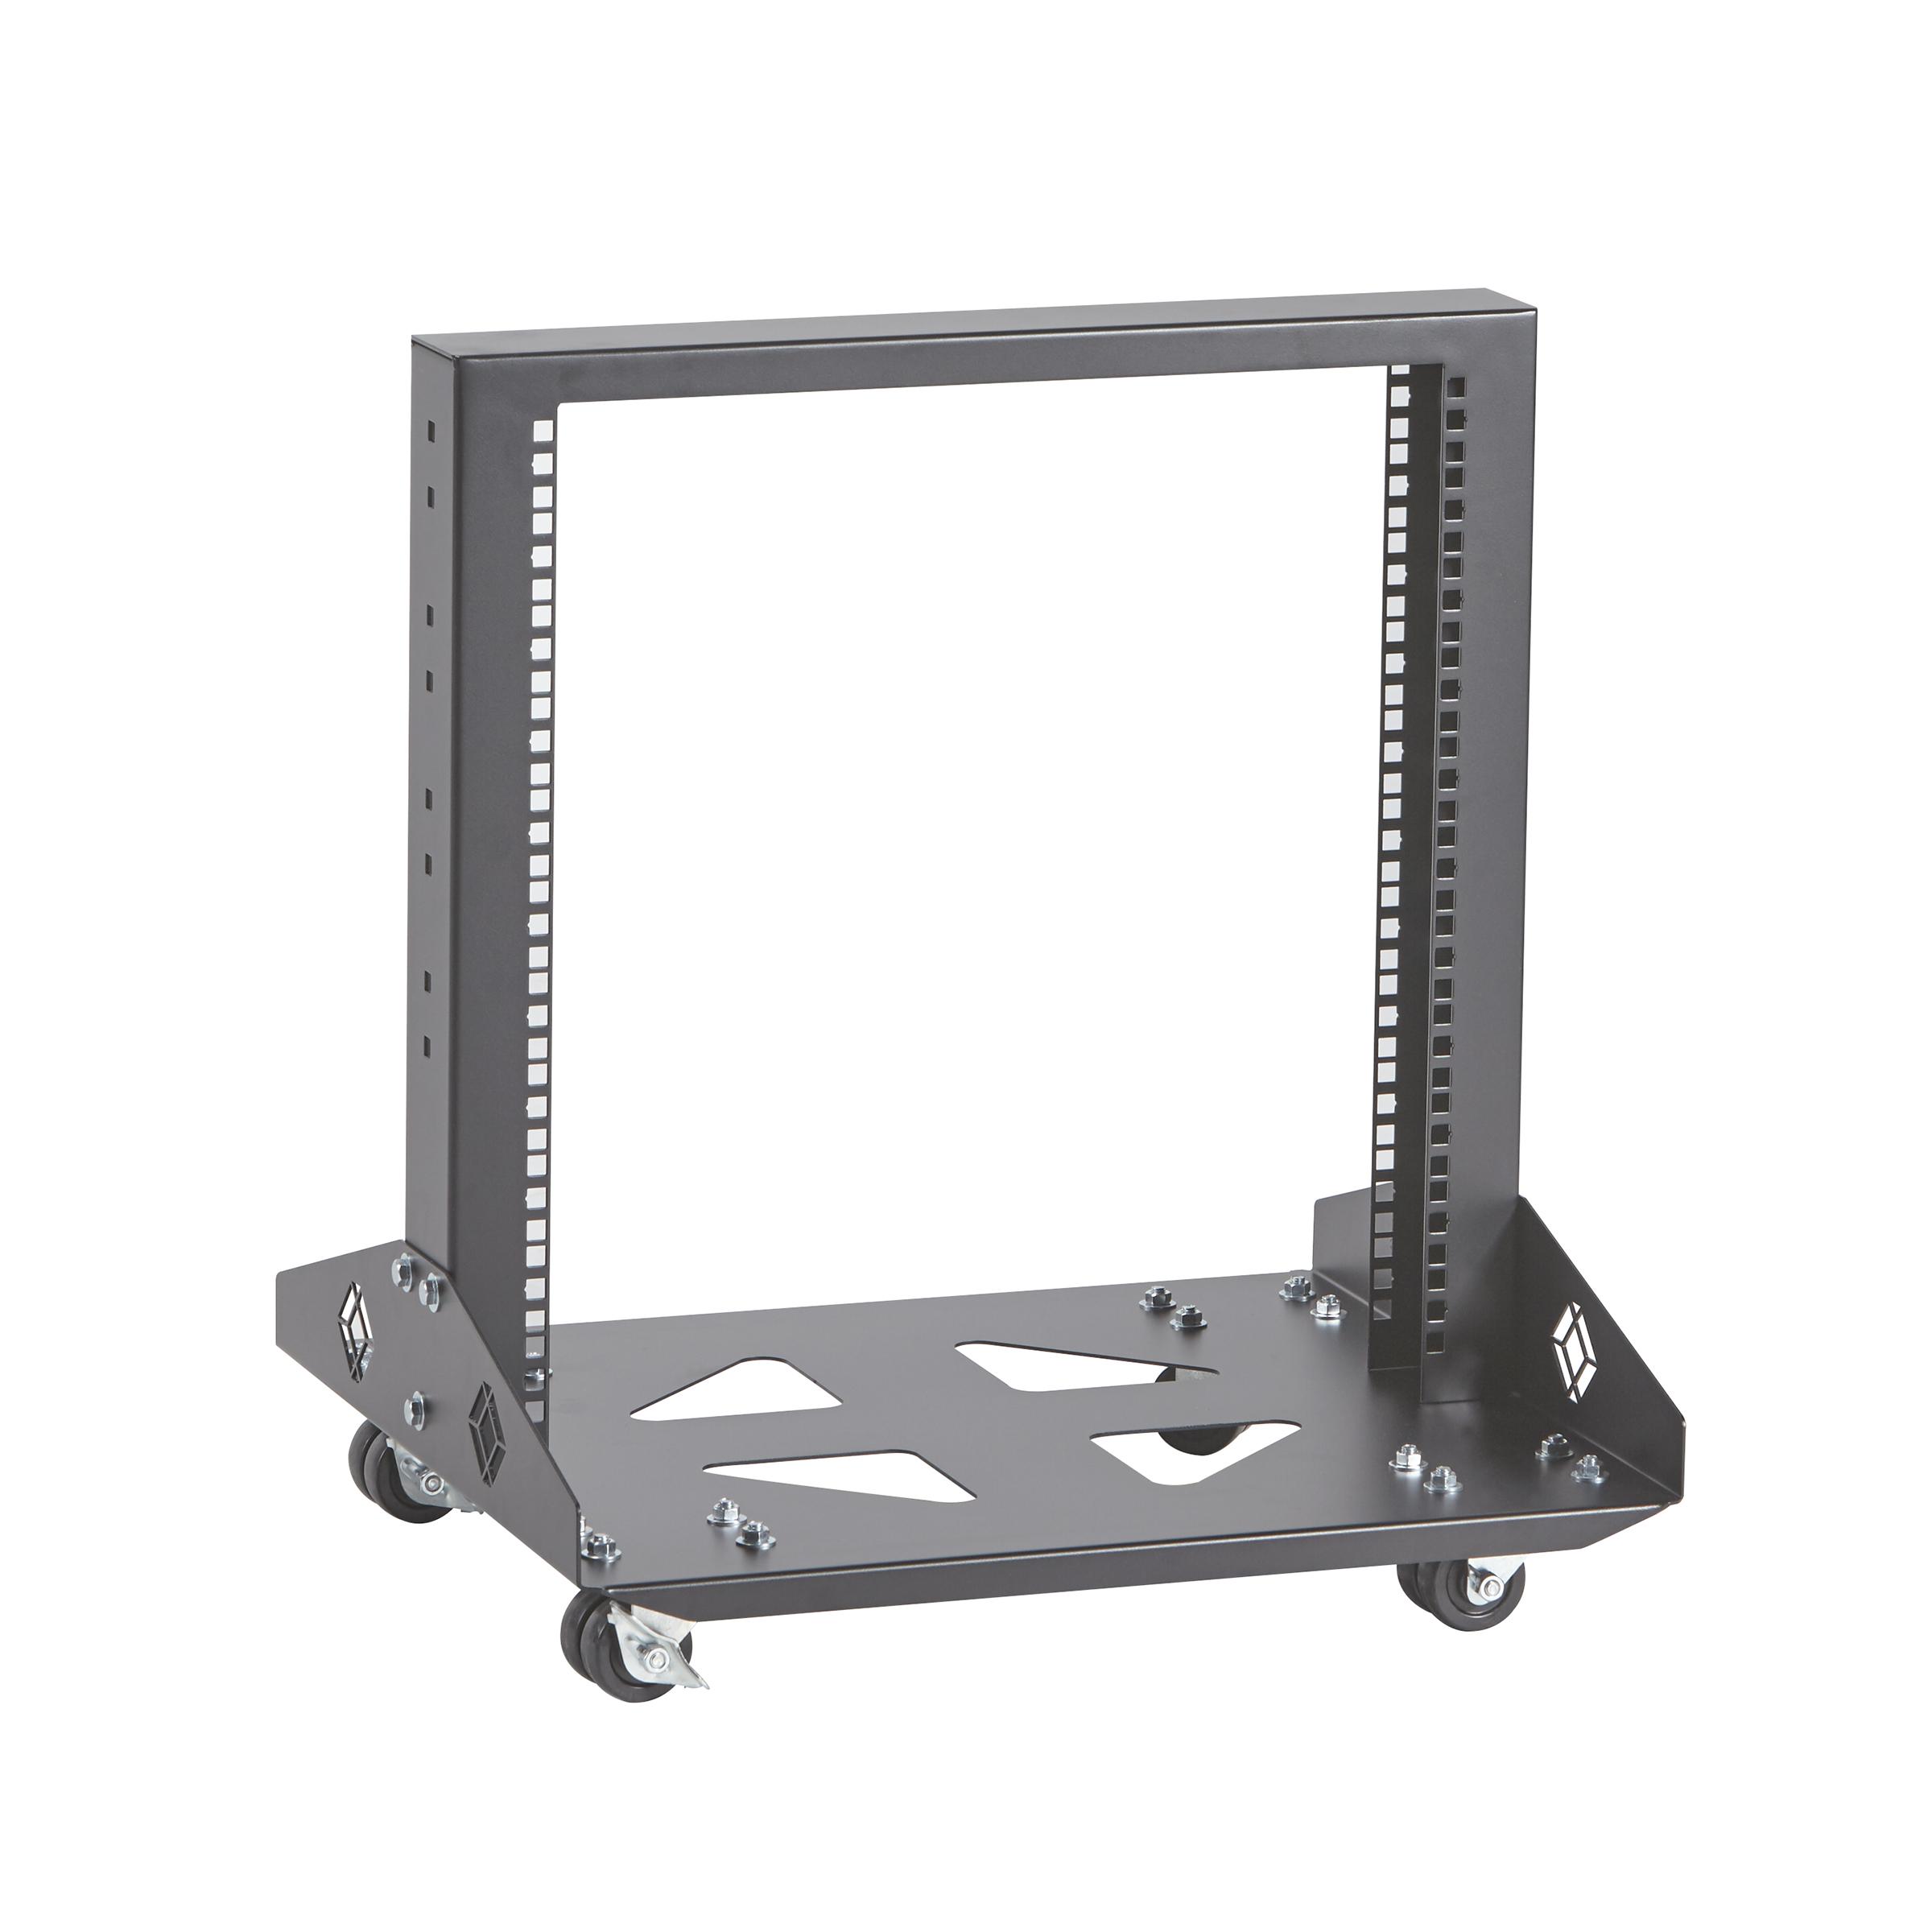 solidsteel gb shelves high shelf rack audio my product inch end hf